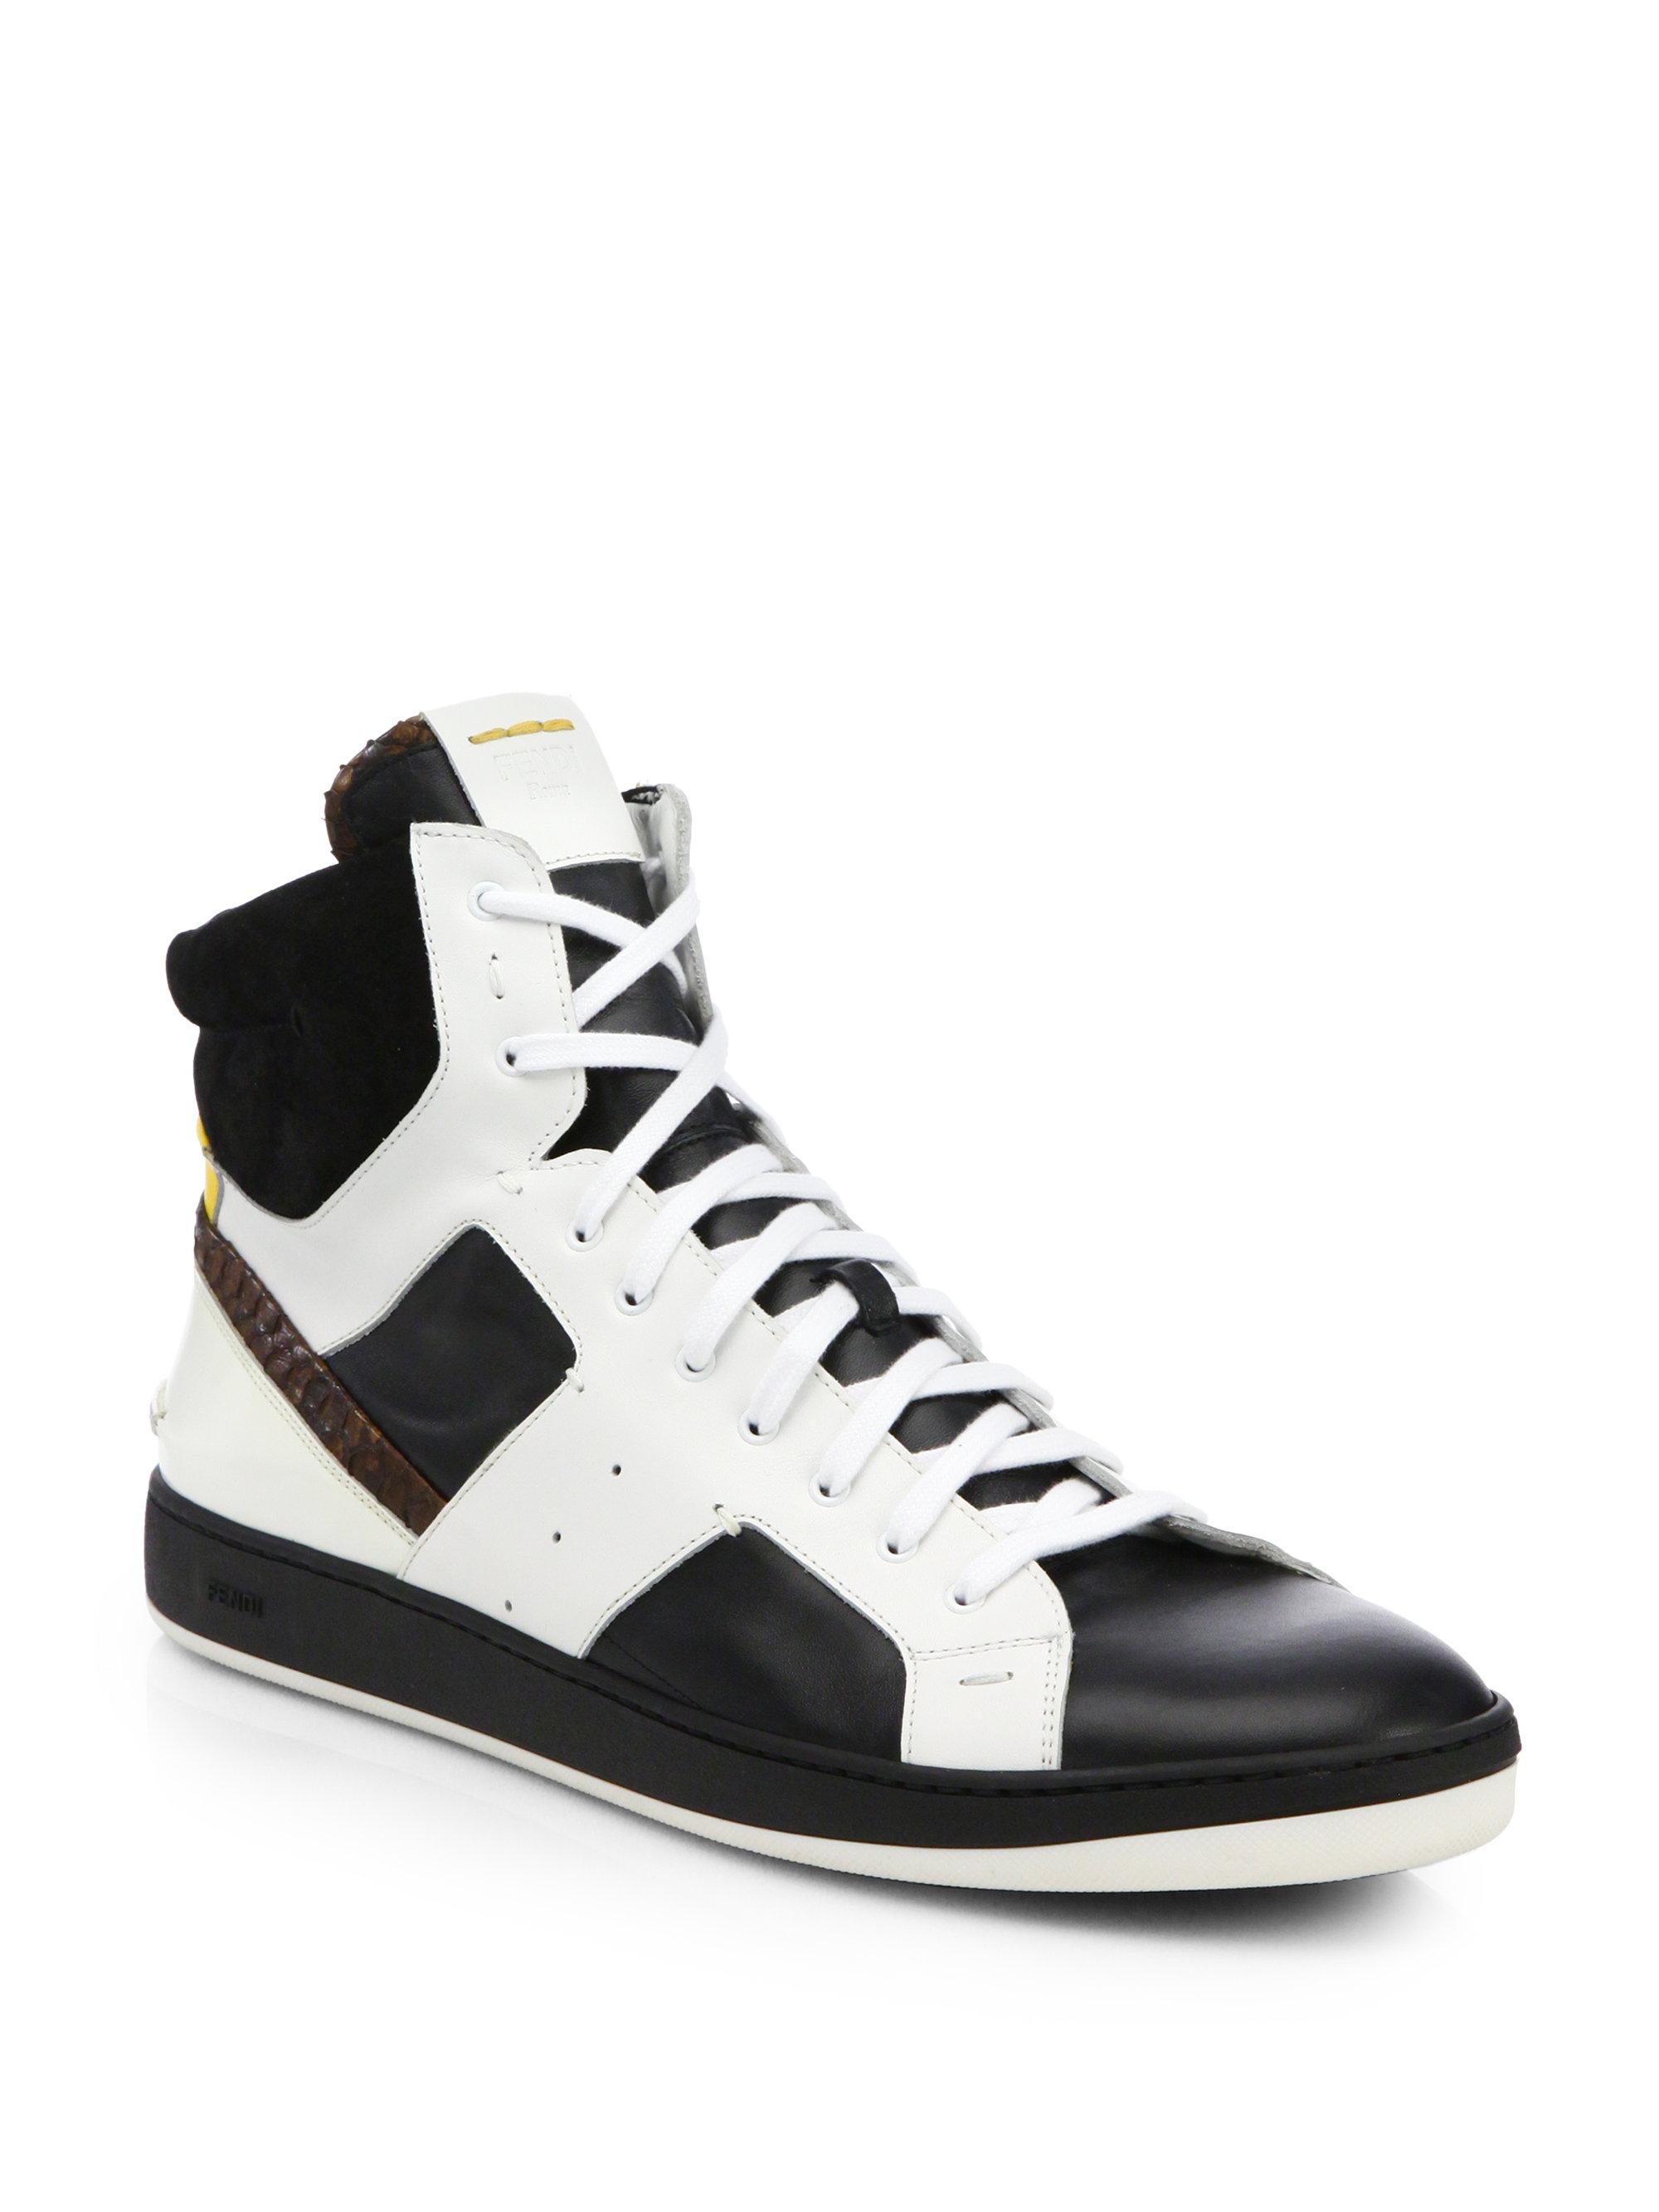 16d62b5c6c00 Fendi Sneakers Black